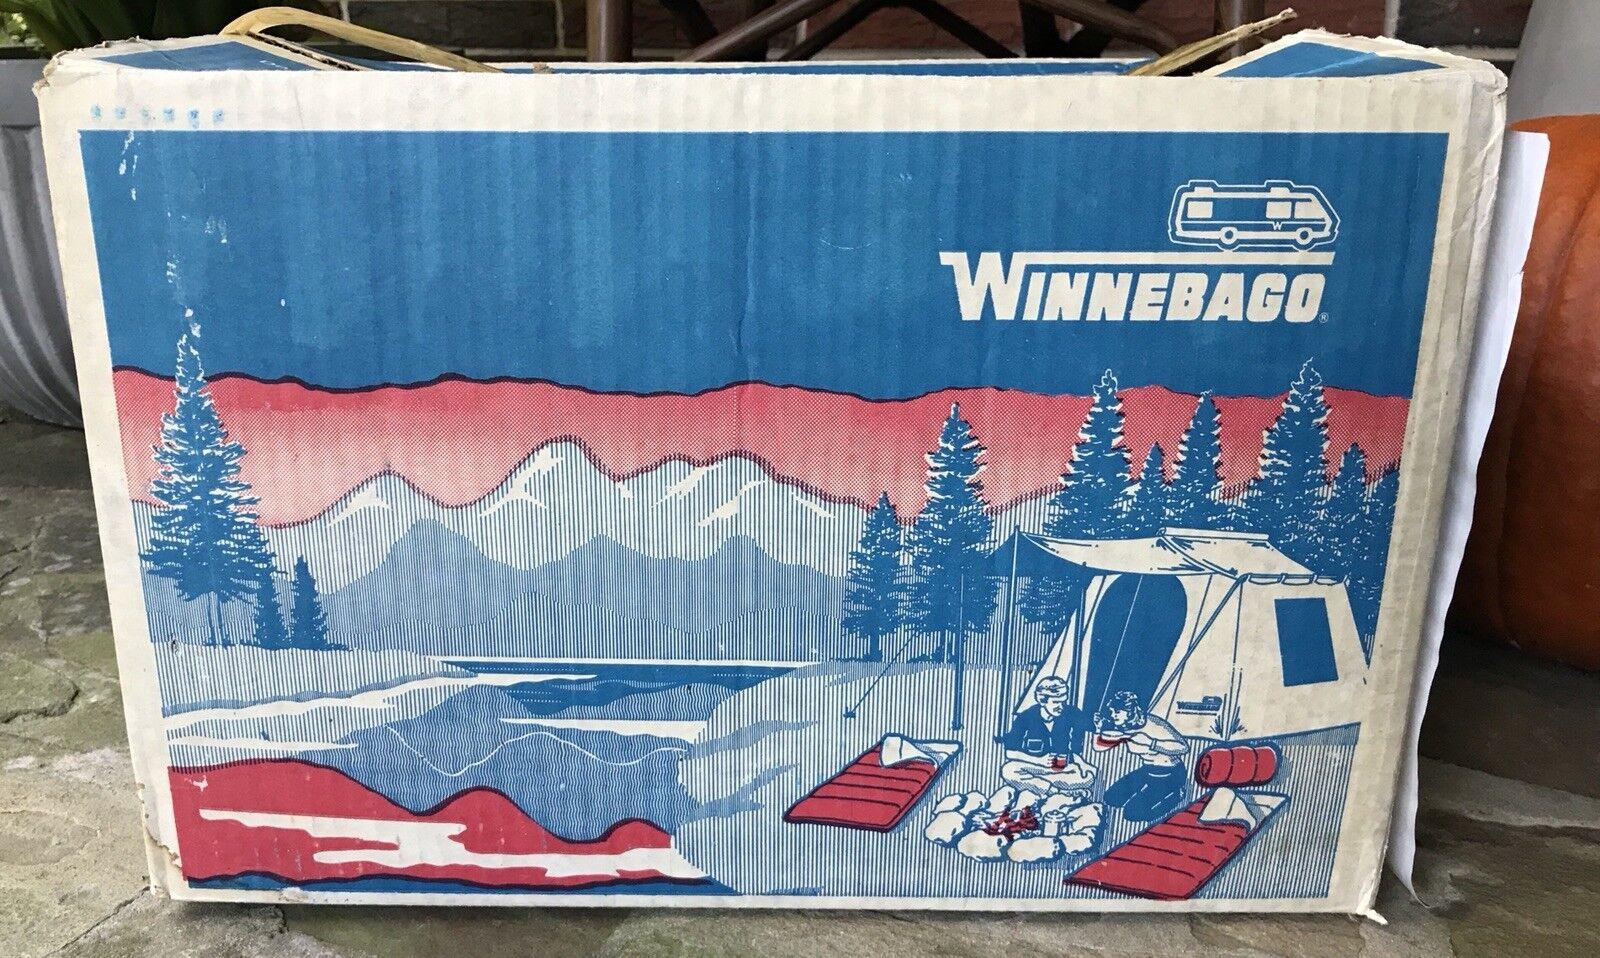 "NIB RARE Vintage WINNEBAGO SLEEPING BAG IN ORIGINAL  BOX 33"" x 75"" 3 lbs BURGUNDY  just for you"